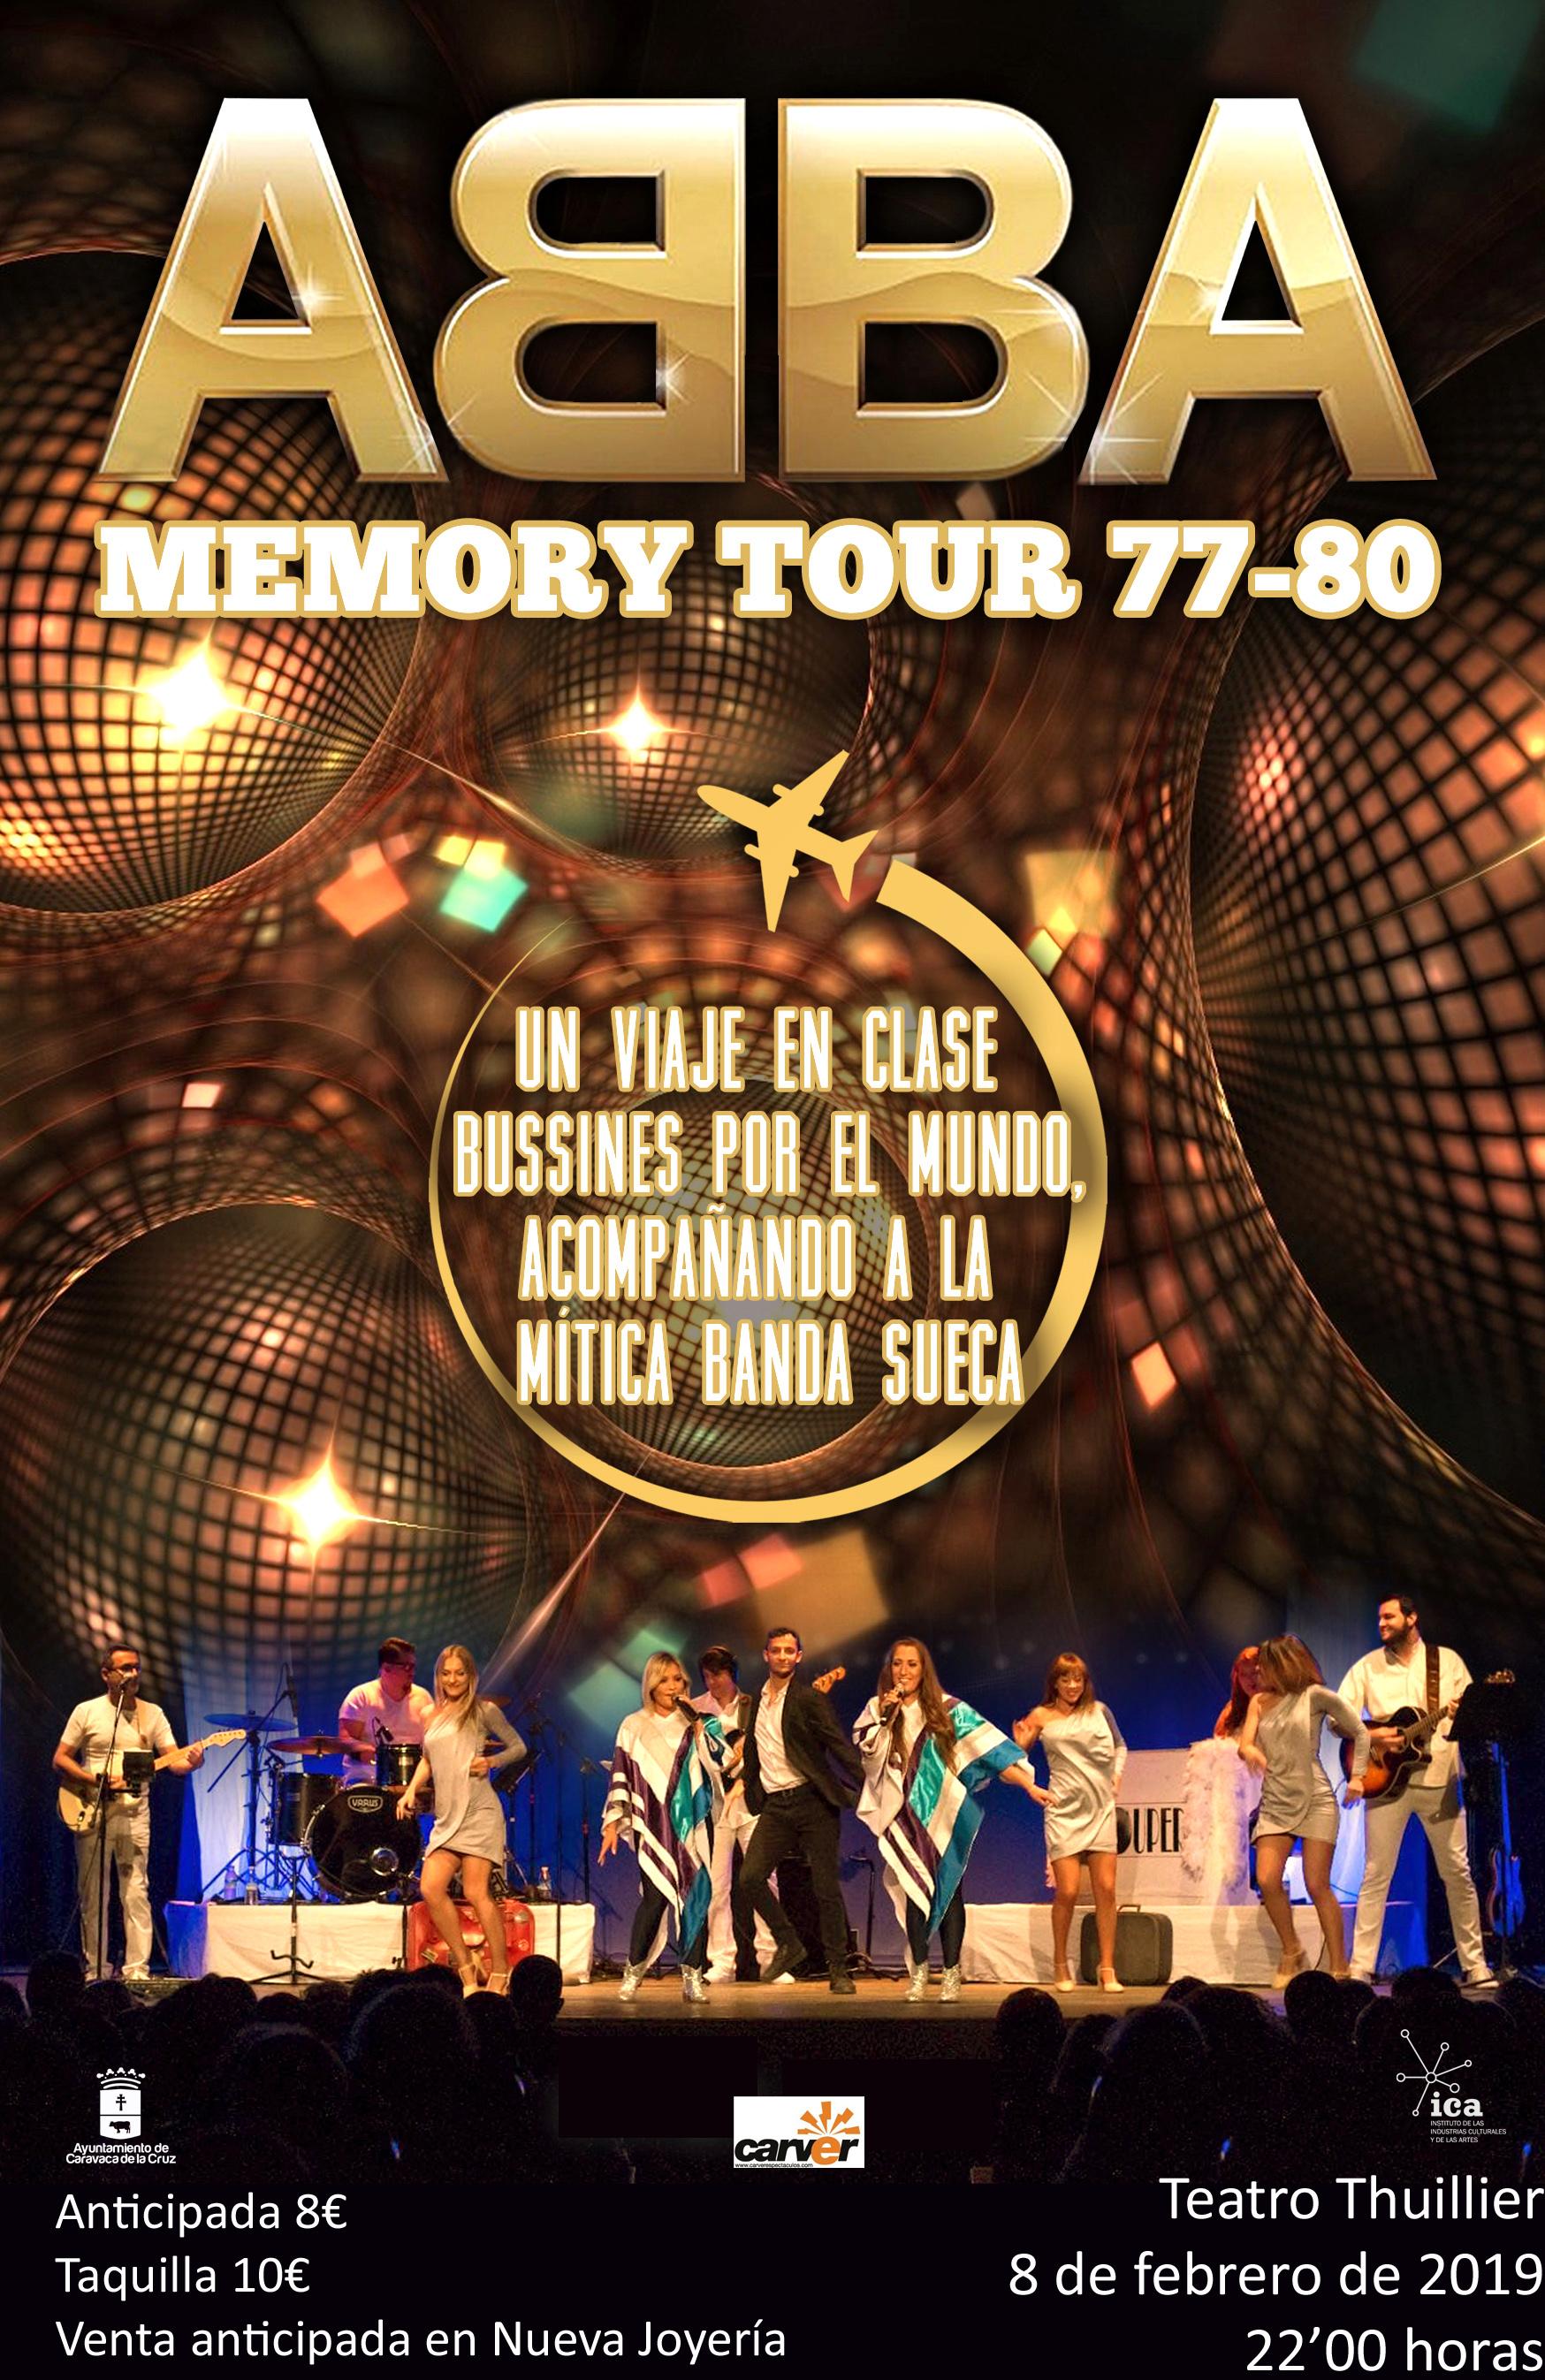 ABBA Memory Tour 77-80